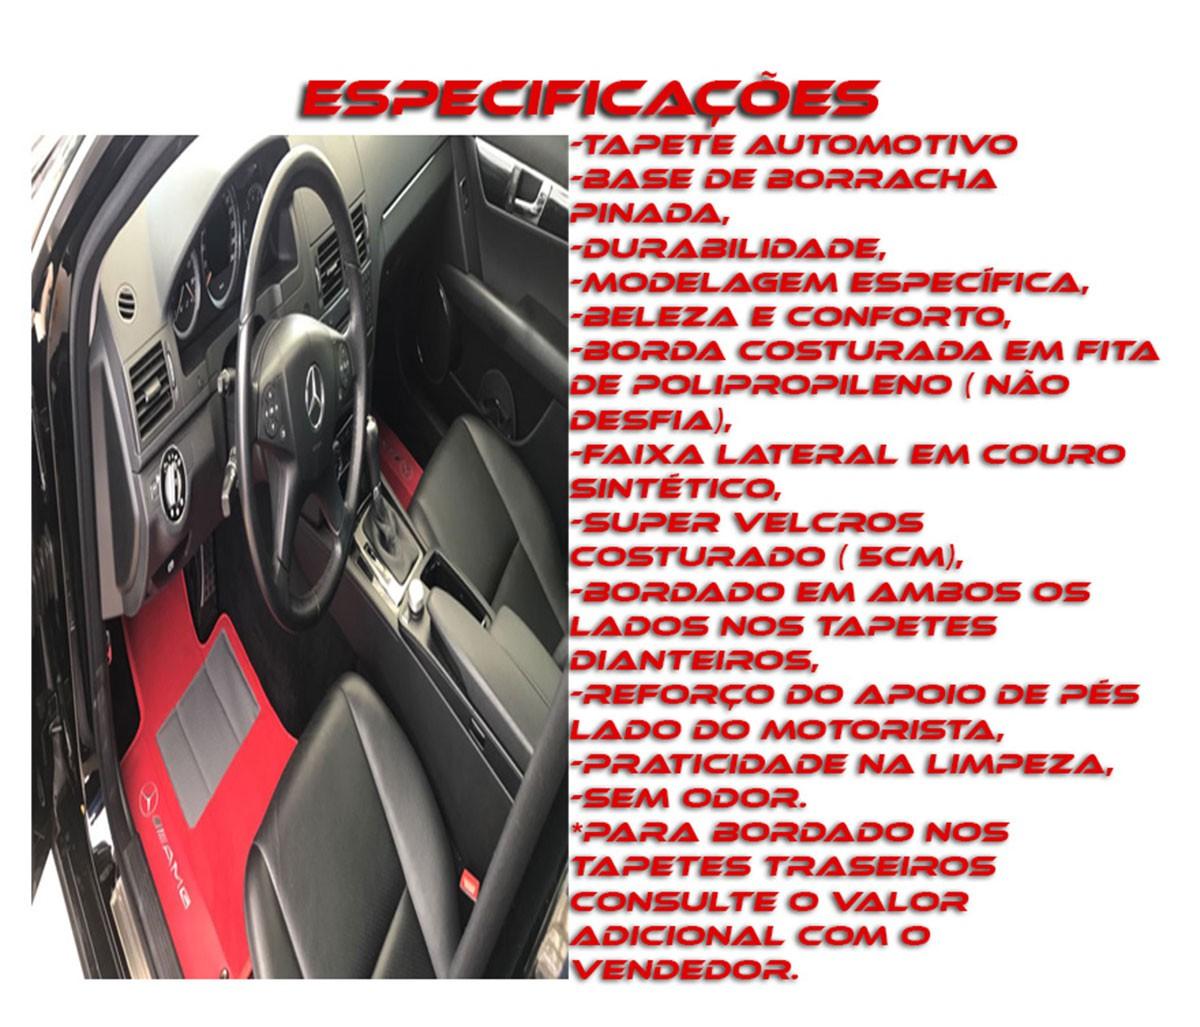 Tapete Alfa Romeo 145 Carpete Luxo Base Borracha Pinada Hitto